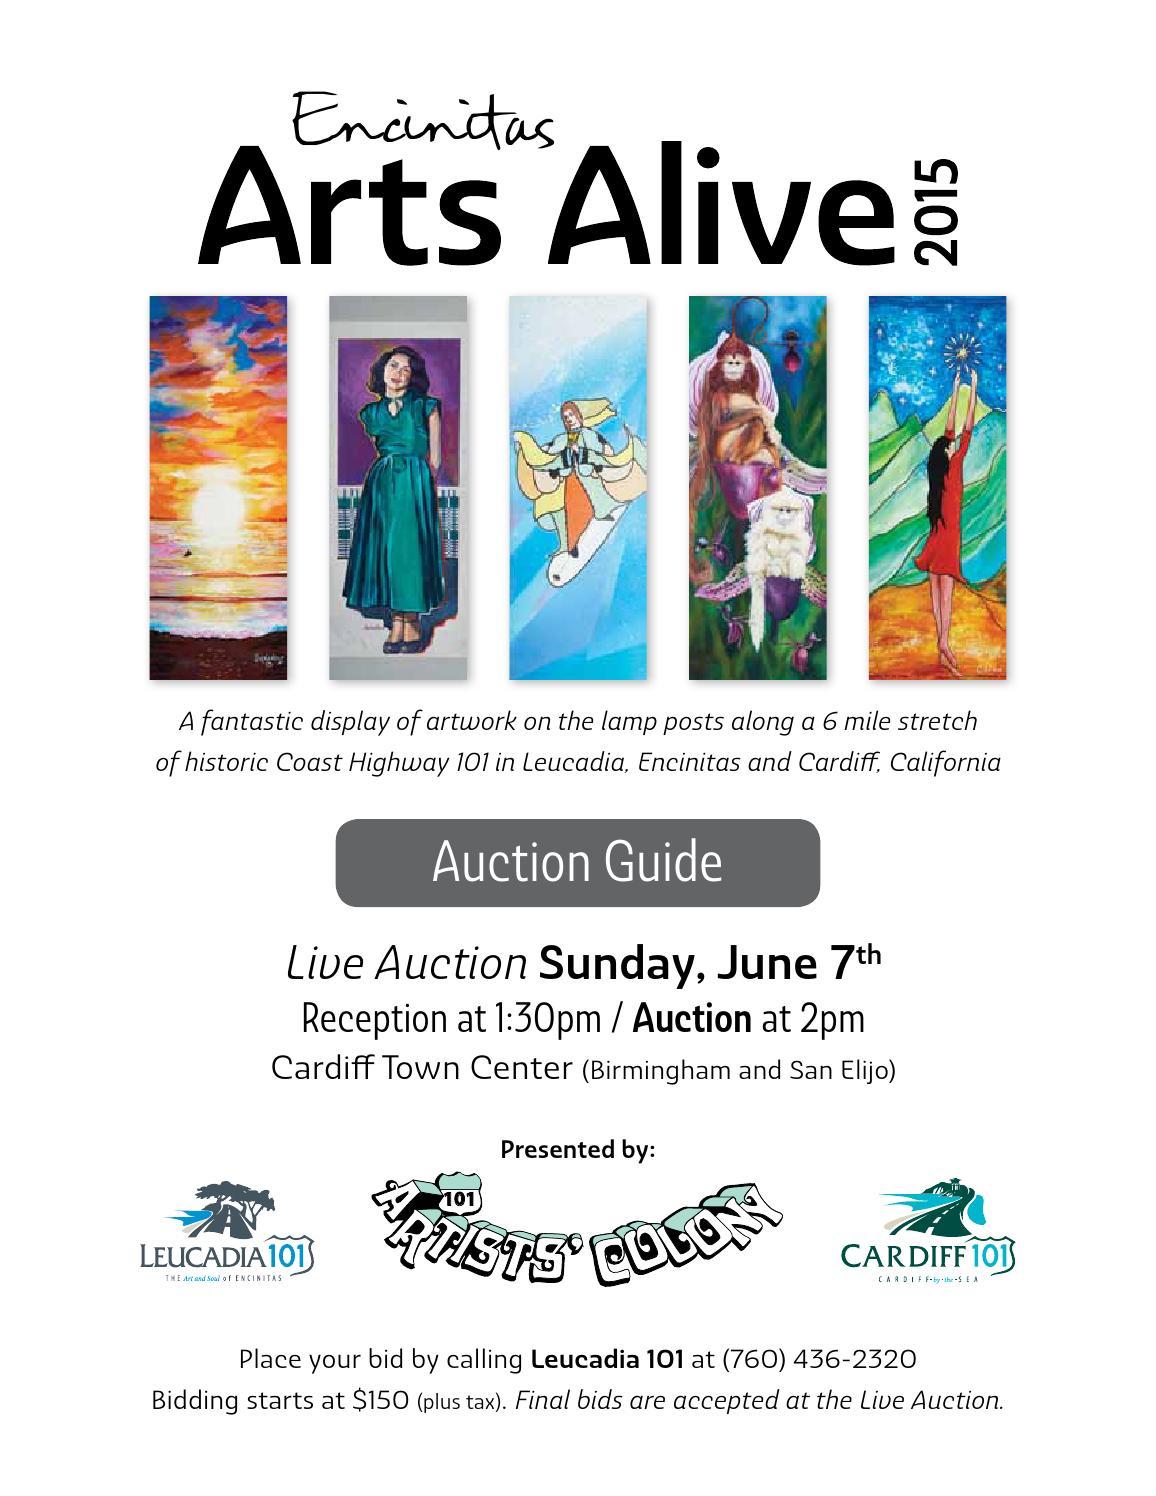 Encinitas 101 Mainstreet Association: 2015 Encinitas Arts Alive Auction Guide By Julie Ann